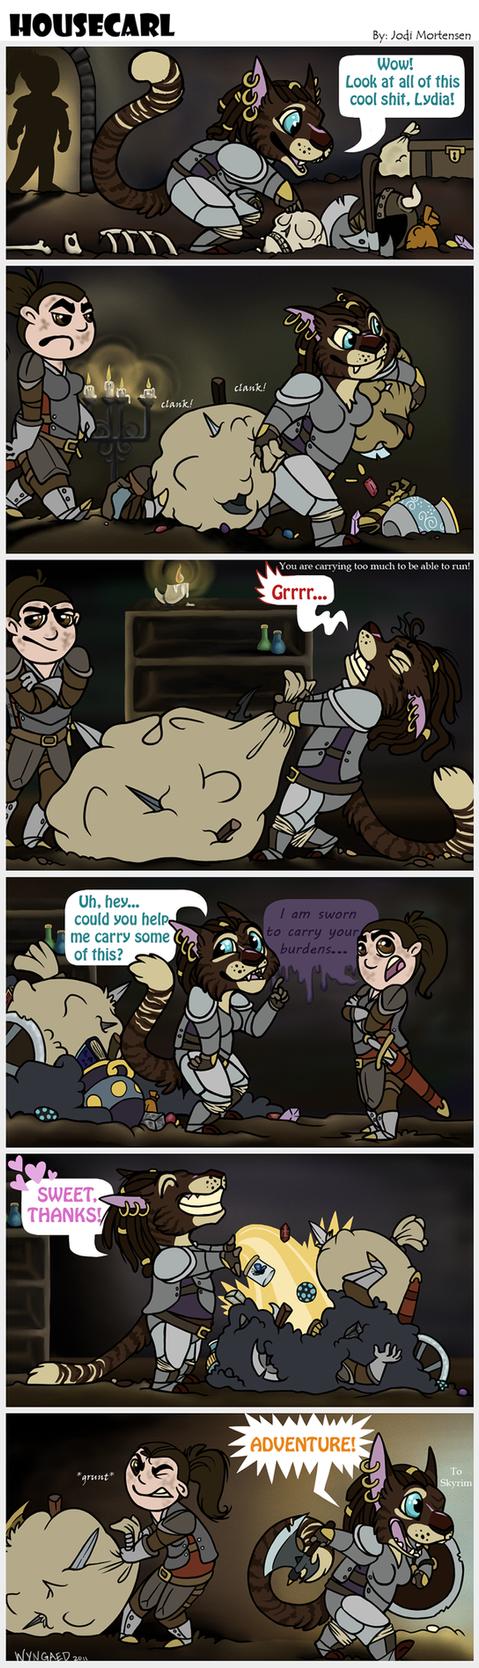 Housecarl - A Skyrim Comic by wyngaed